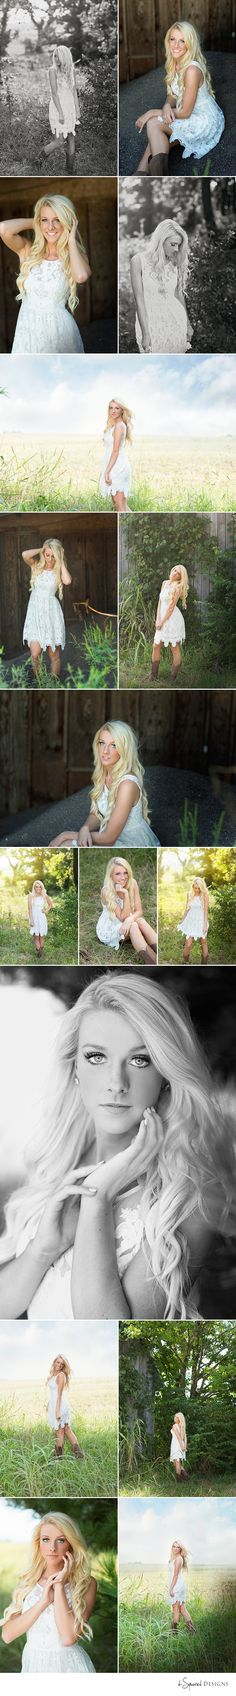 d-Squared Designs St. Louis, MO Senior Photography. Senior Photography. Country Senior Session. Rustic senior. Gorgeous blonde senior.